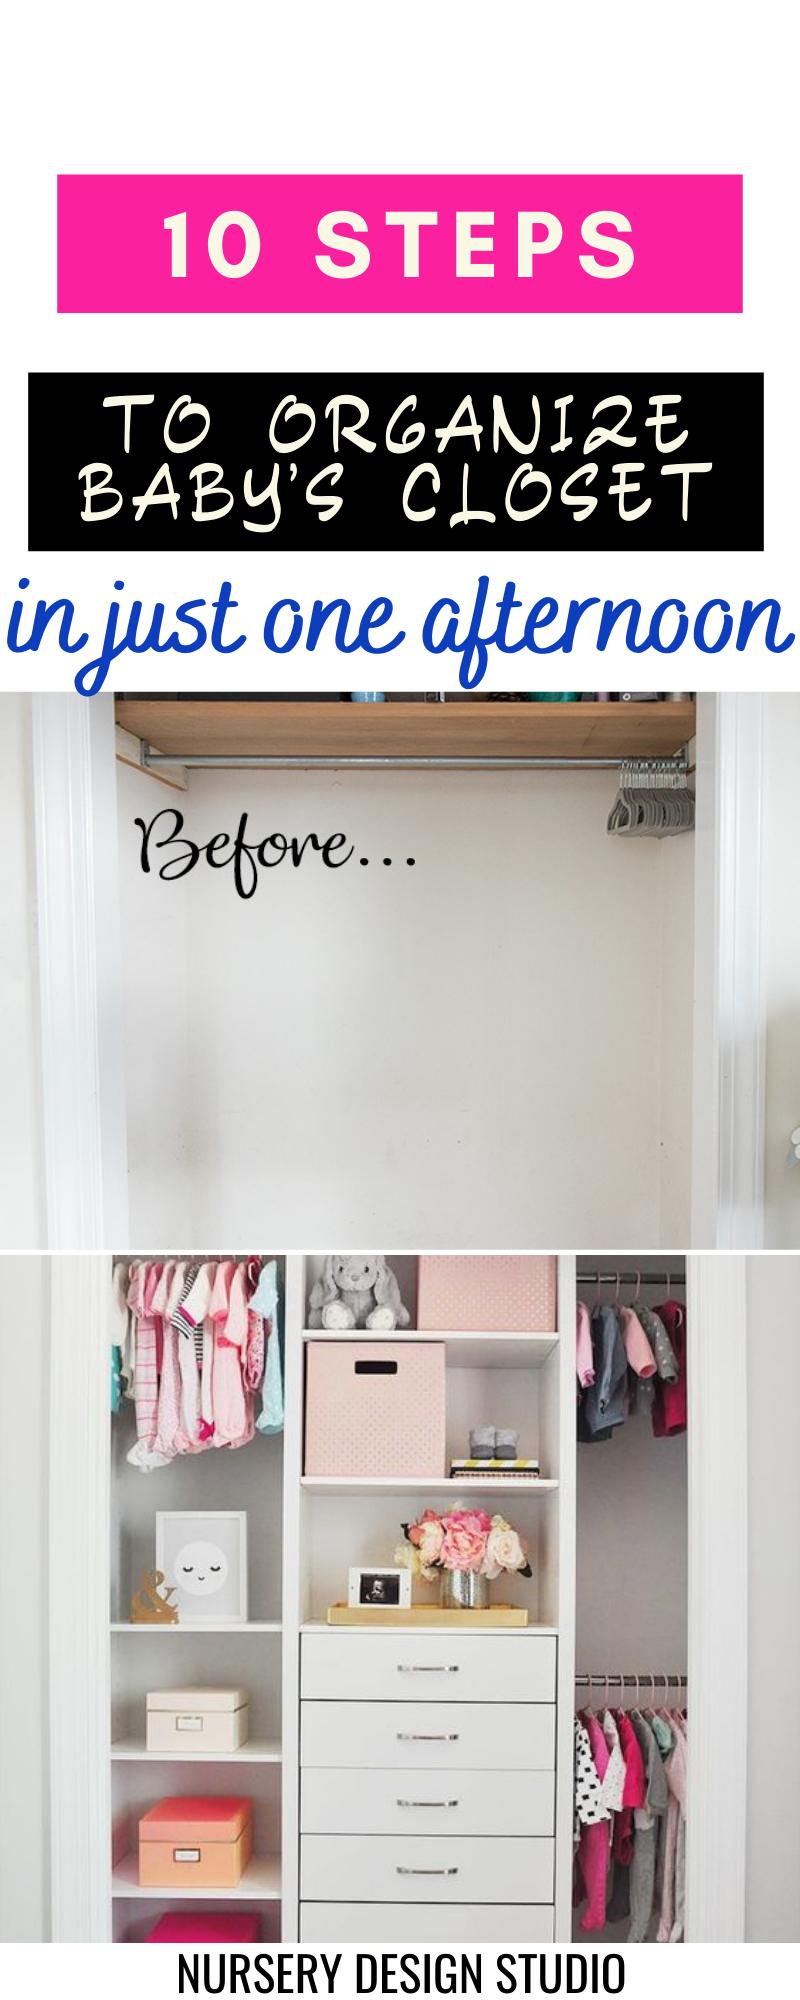 organize baby's closet